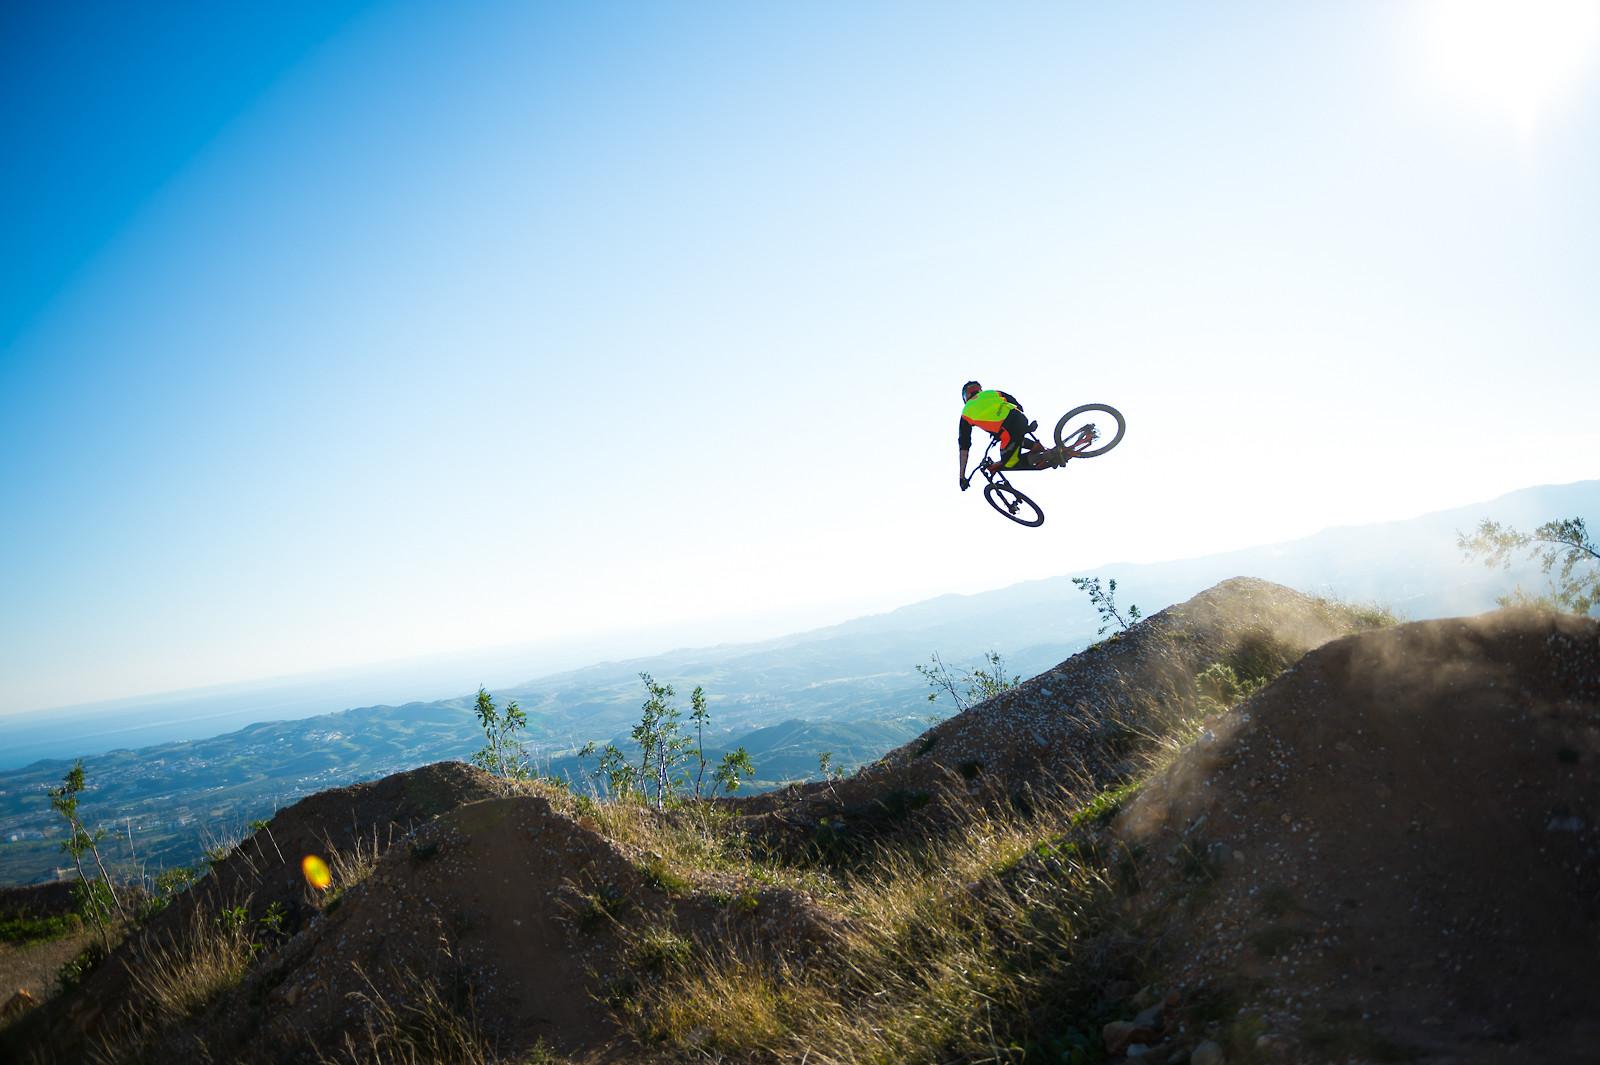 Malaga Sender - iceman2058 - Mountain Biking Pictures - Vital MTB